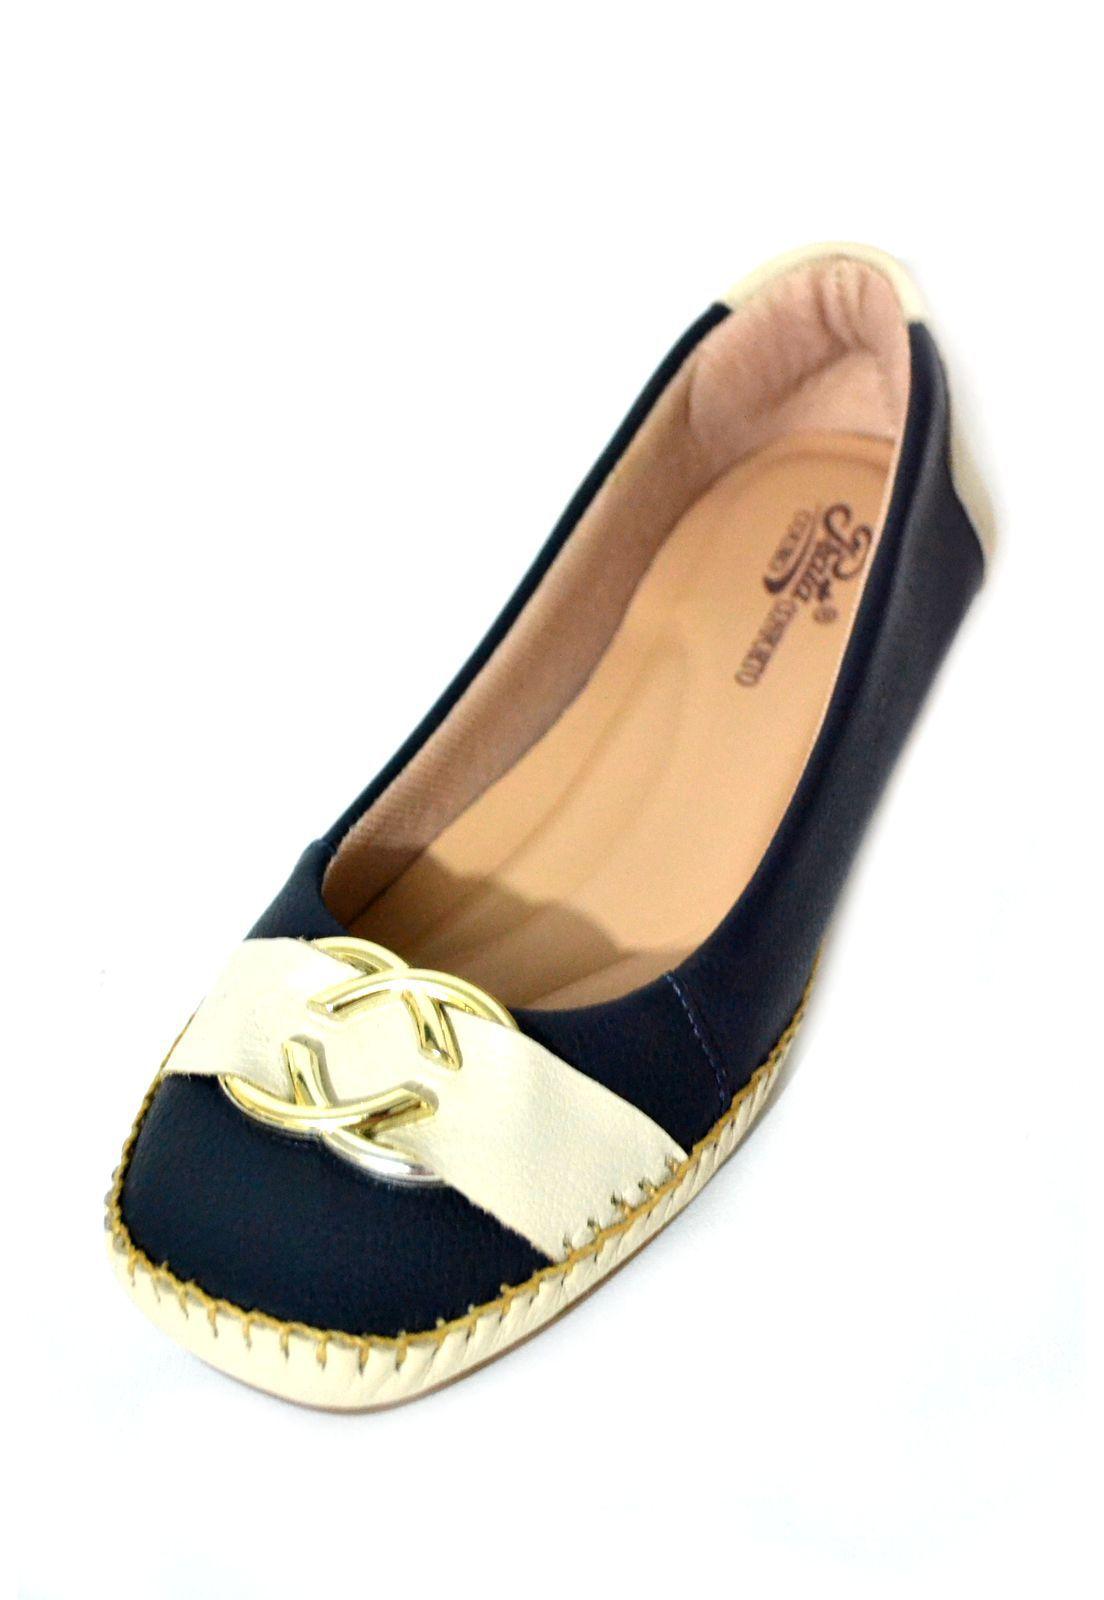 Sapato Feminino  Conforto Prata Couro 1010016 Marinho